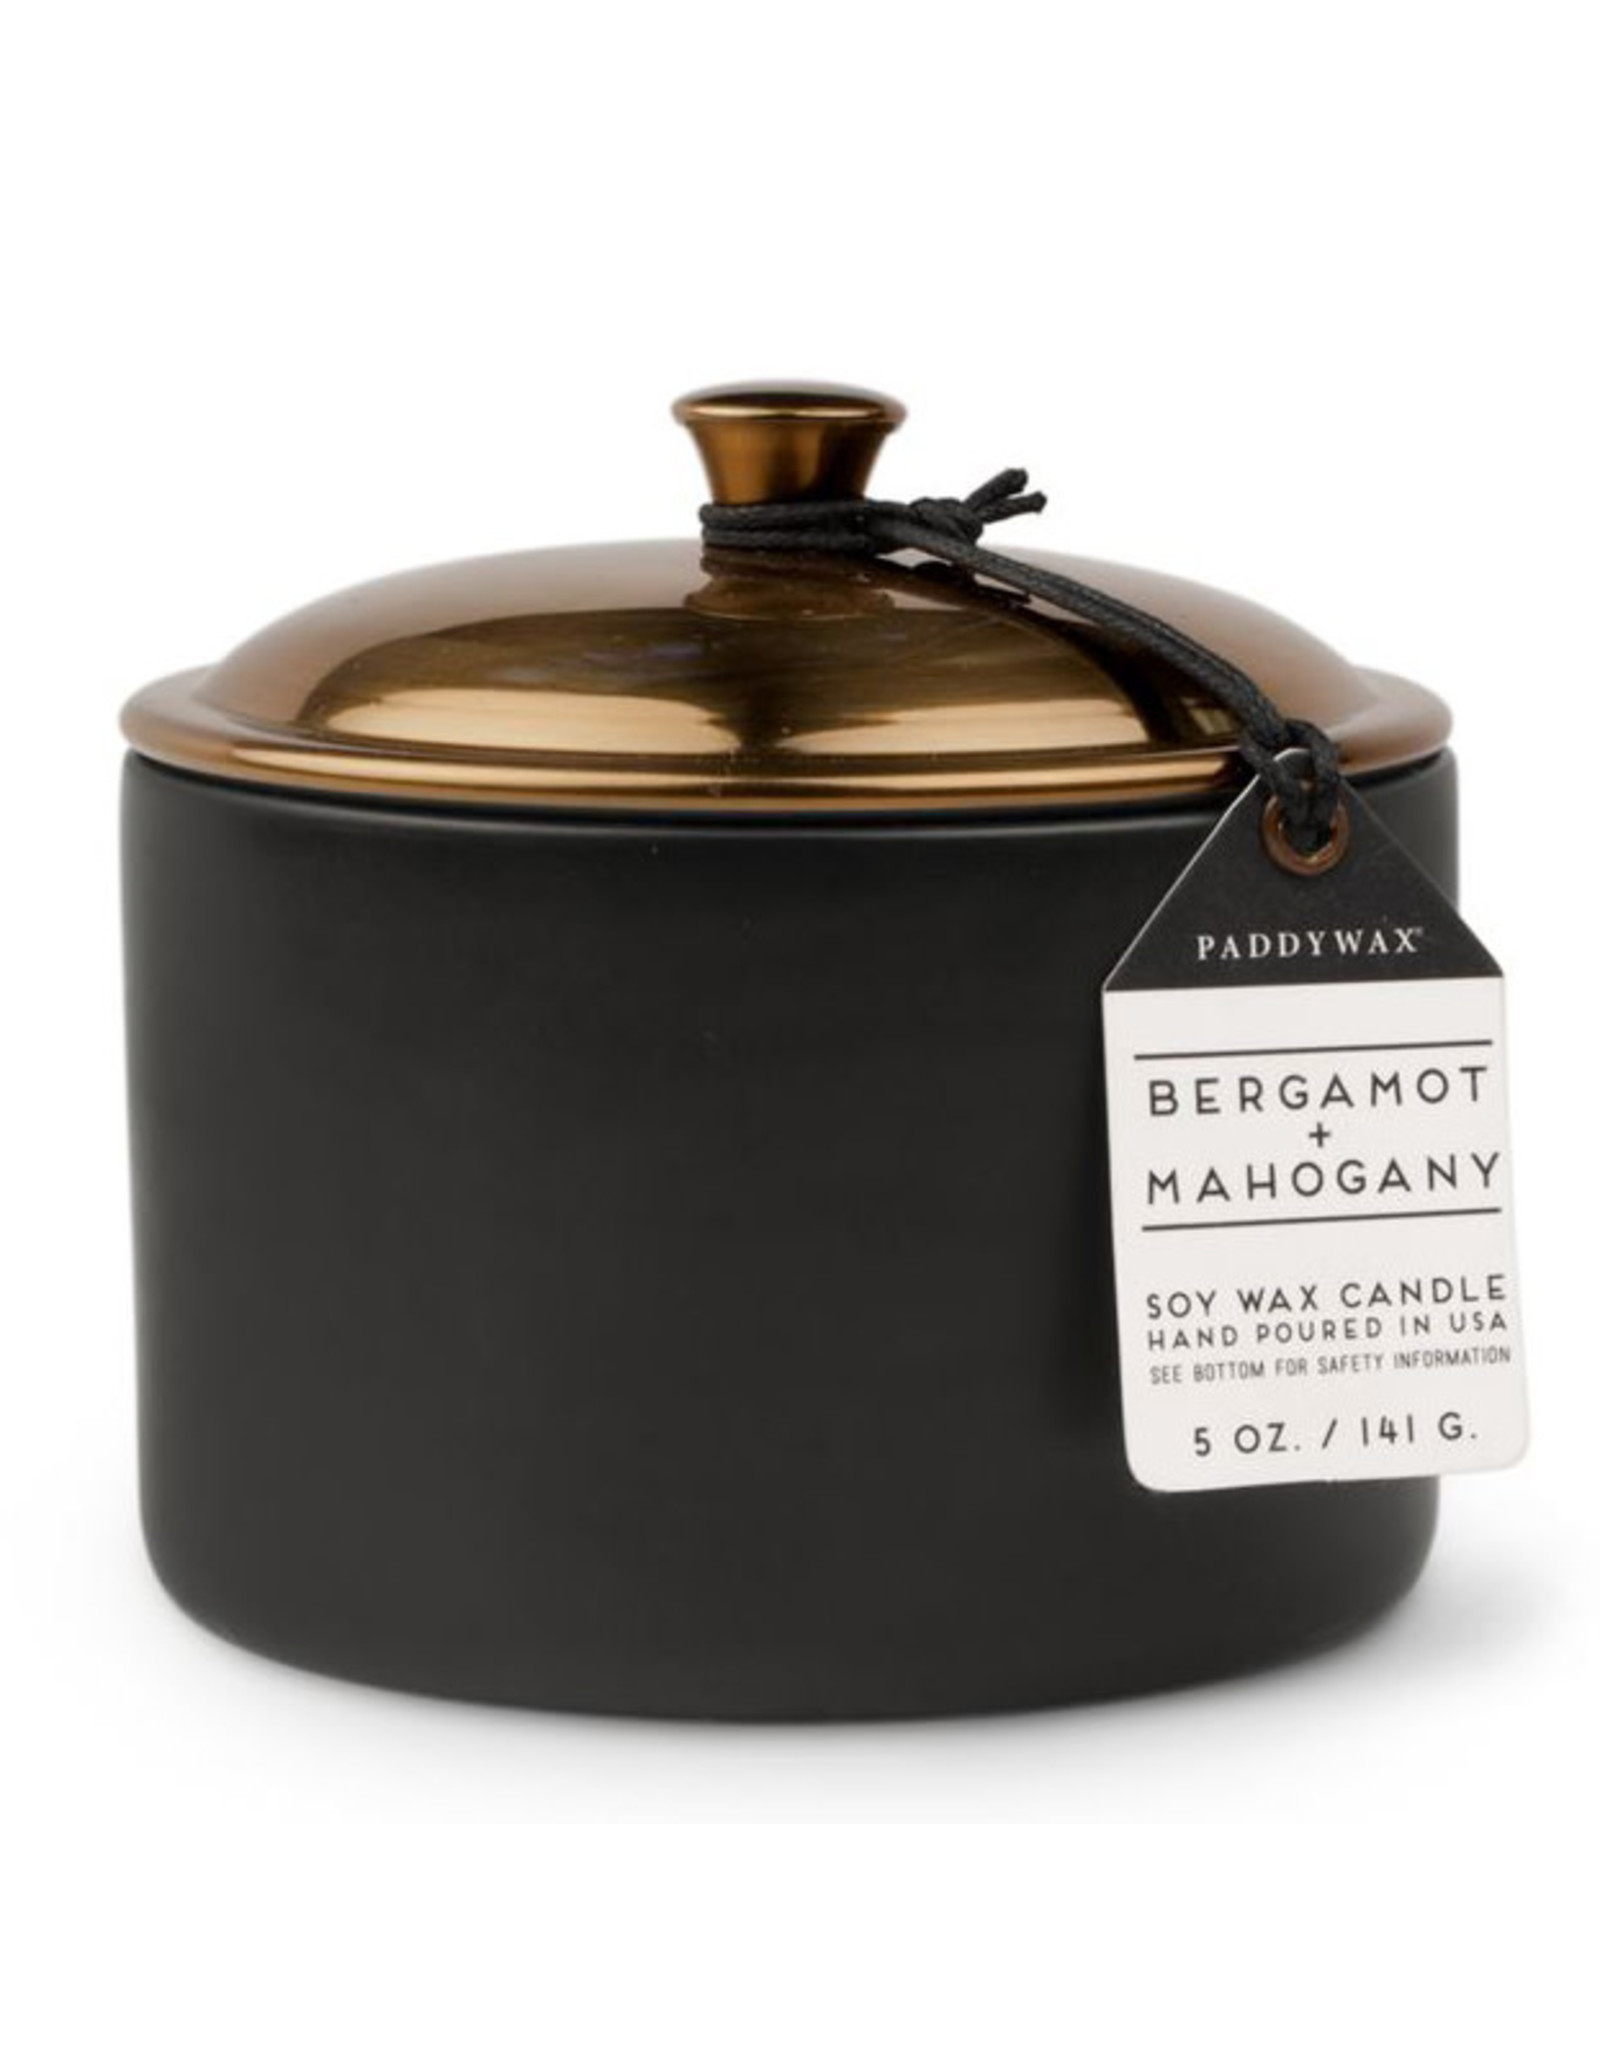 Paddywax Bergamot + Mahogany Hygge 5oz Black Ceramic Candle